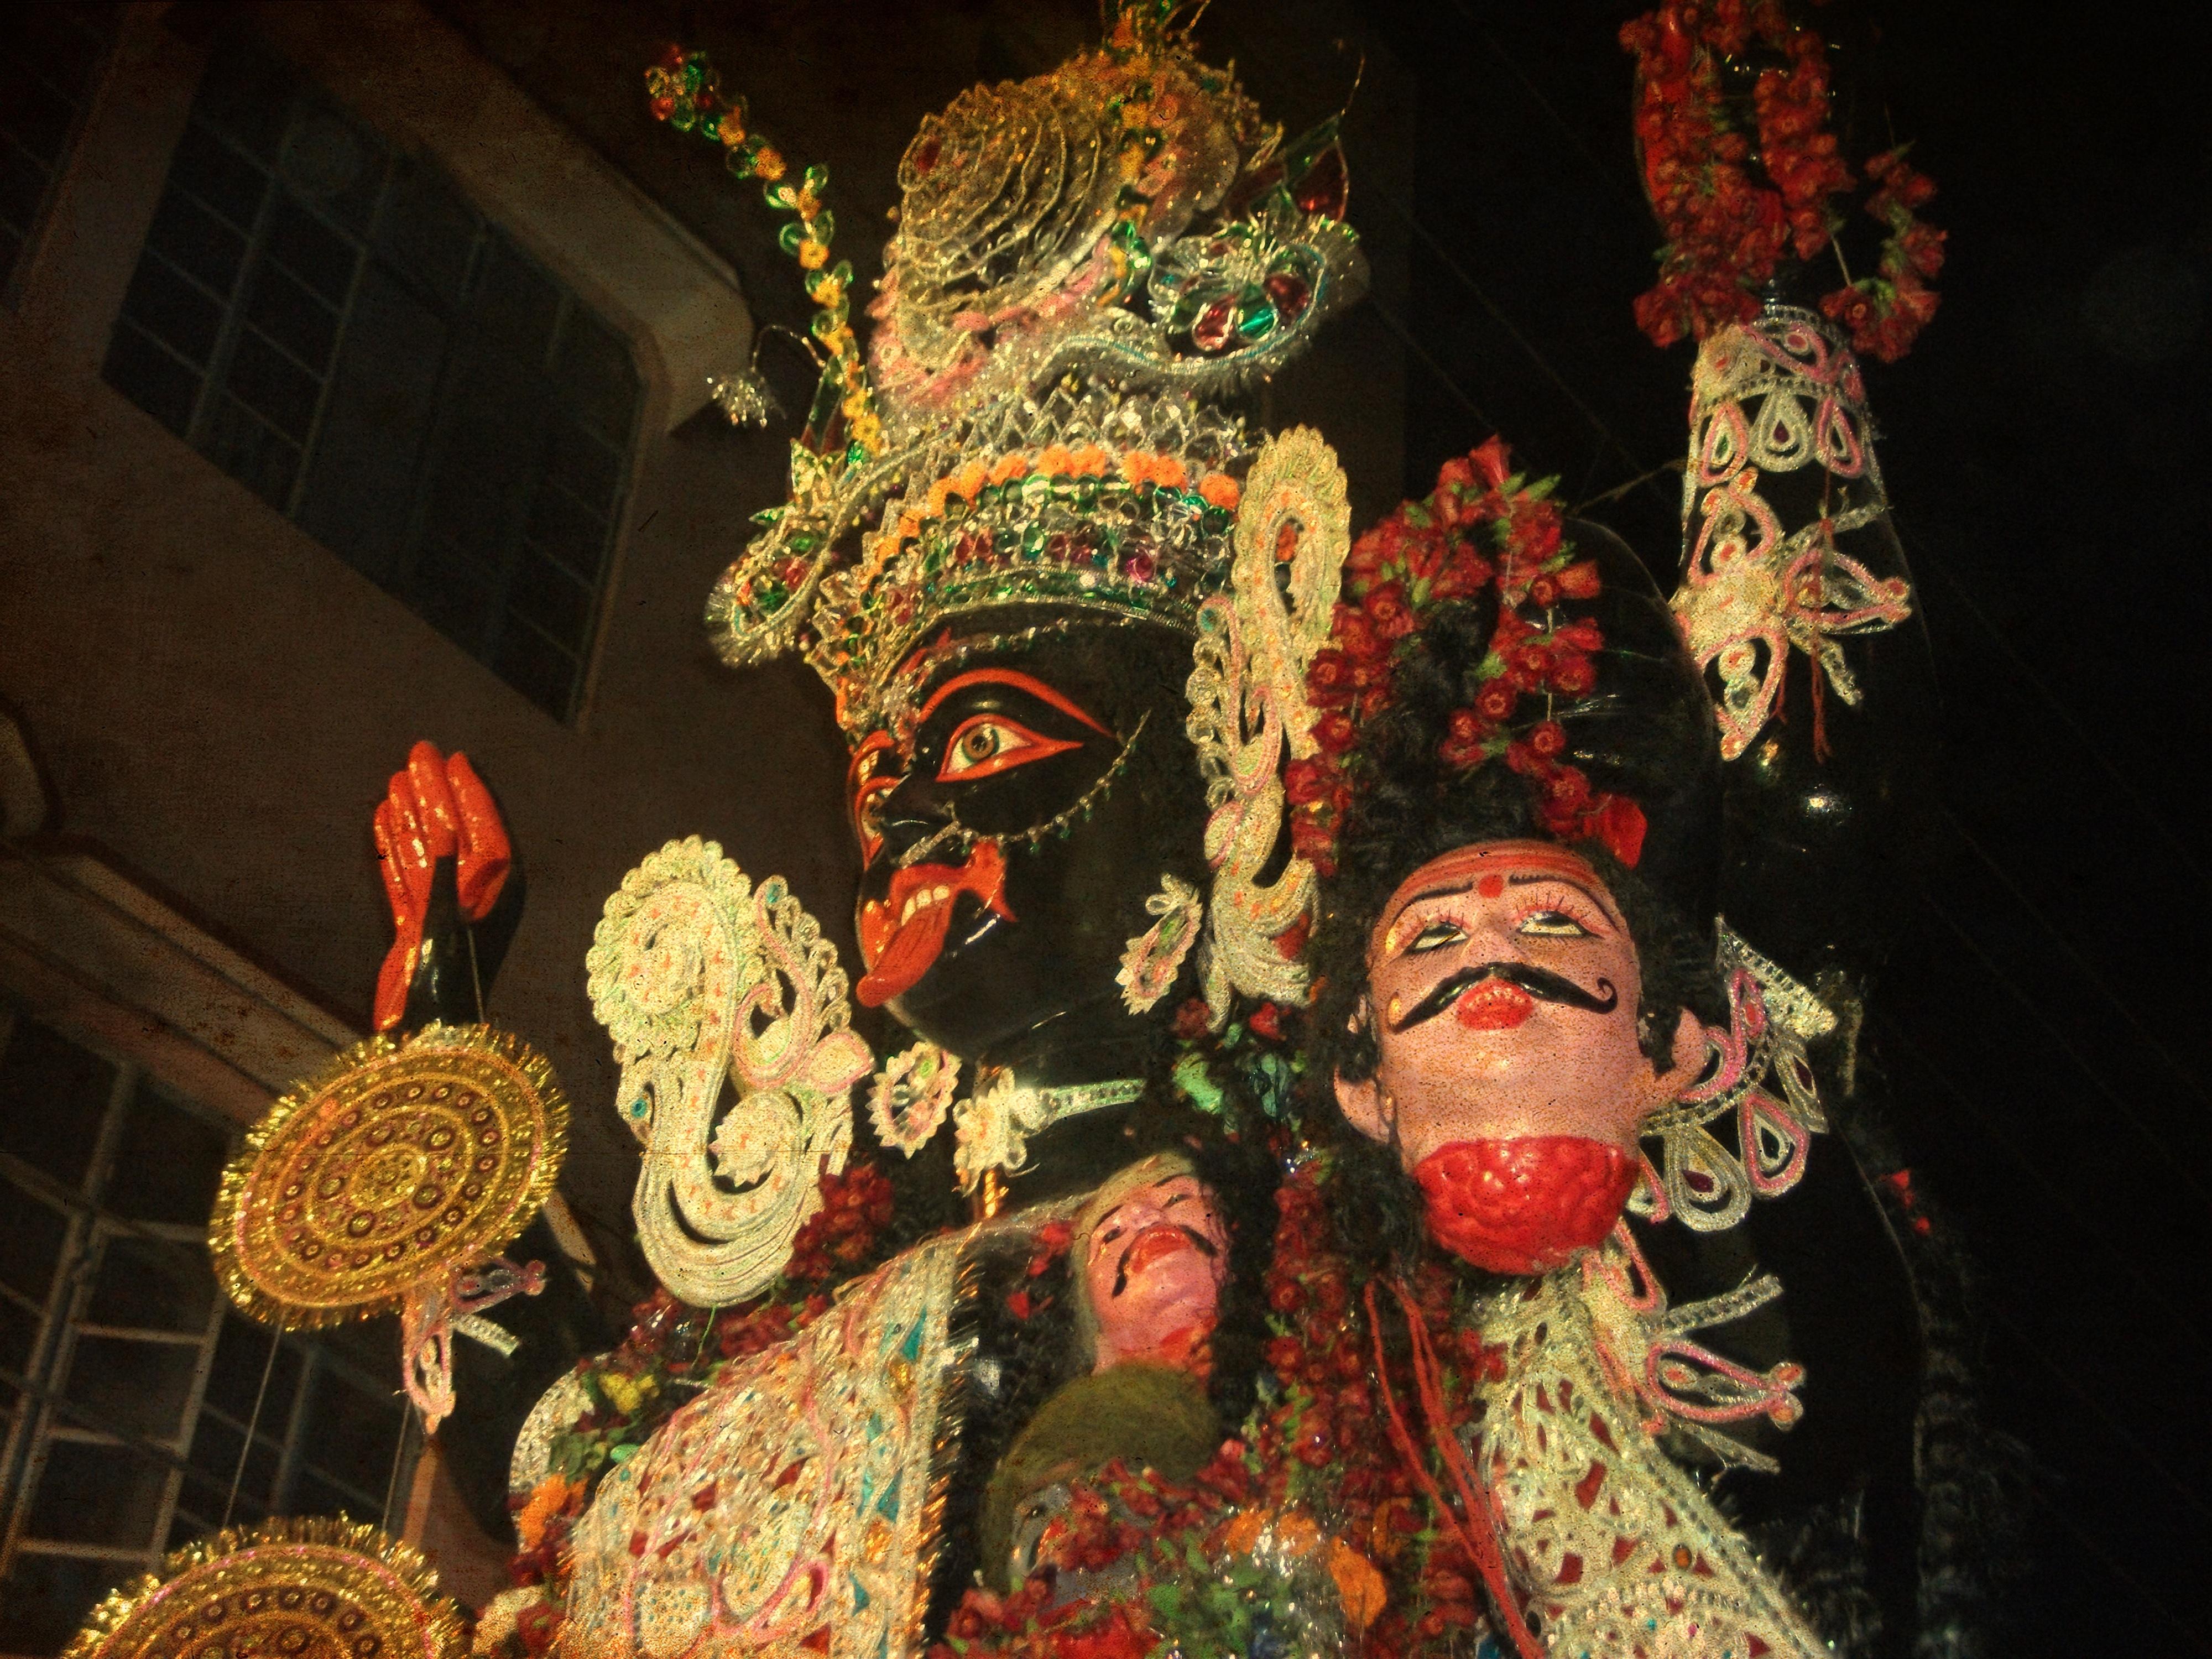 Cool Wallpaper Lord Kali - dscf2754  You Should Have_67725.jpg